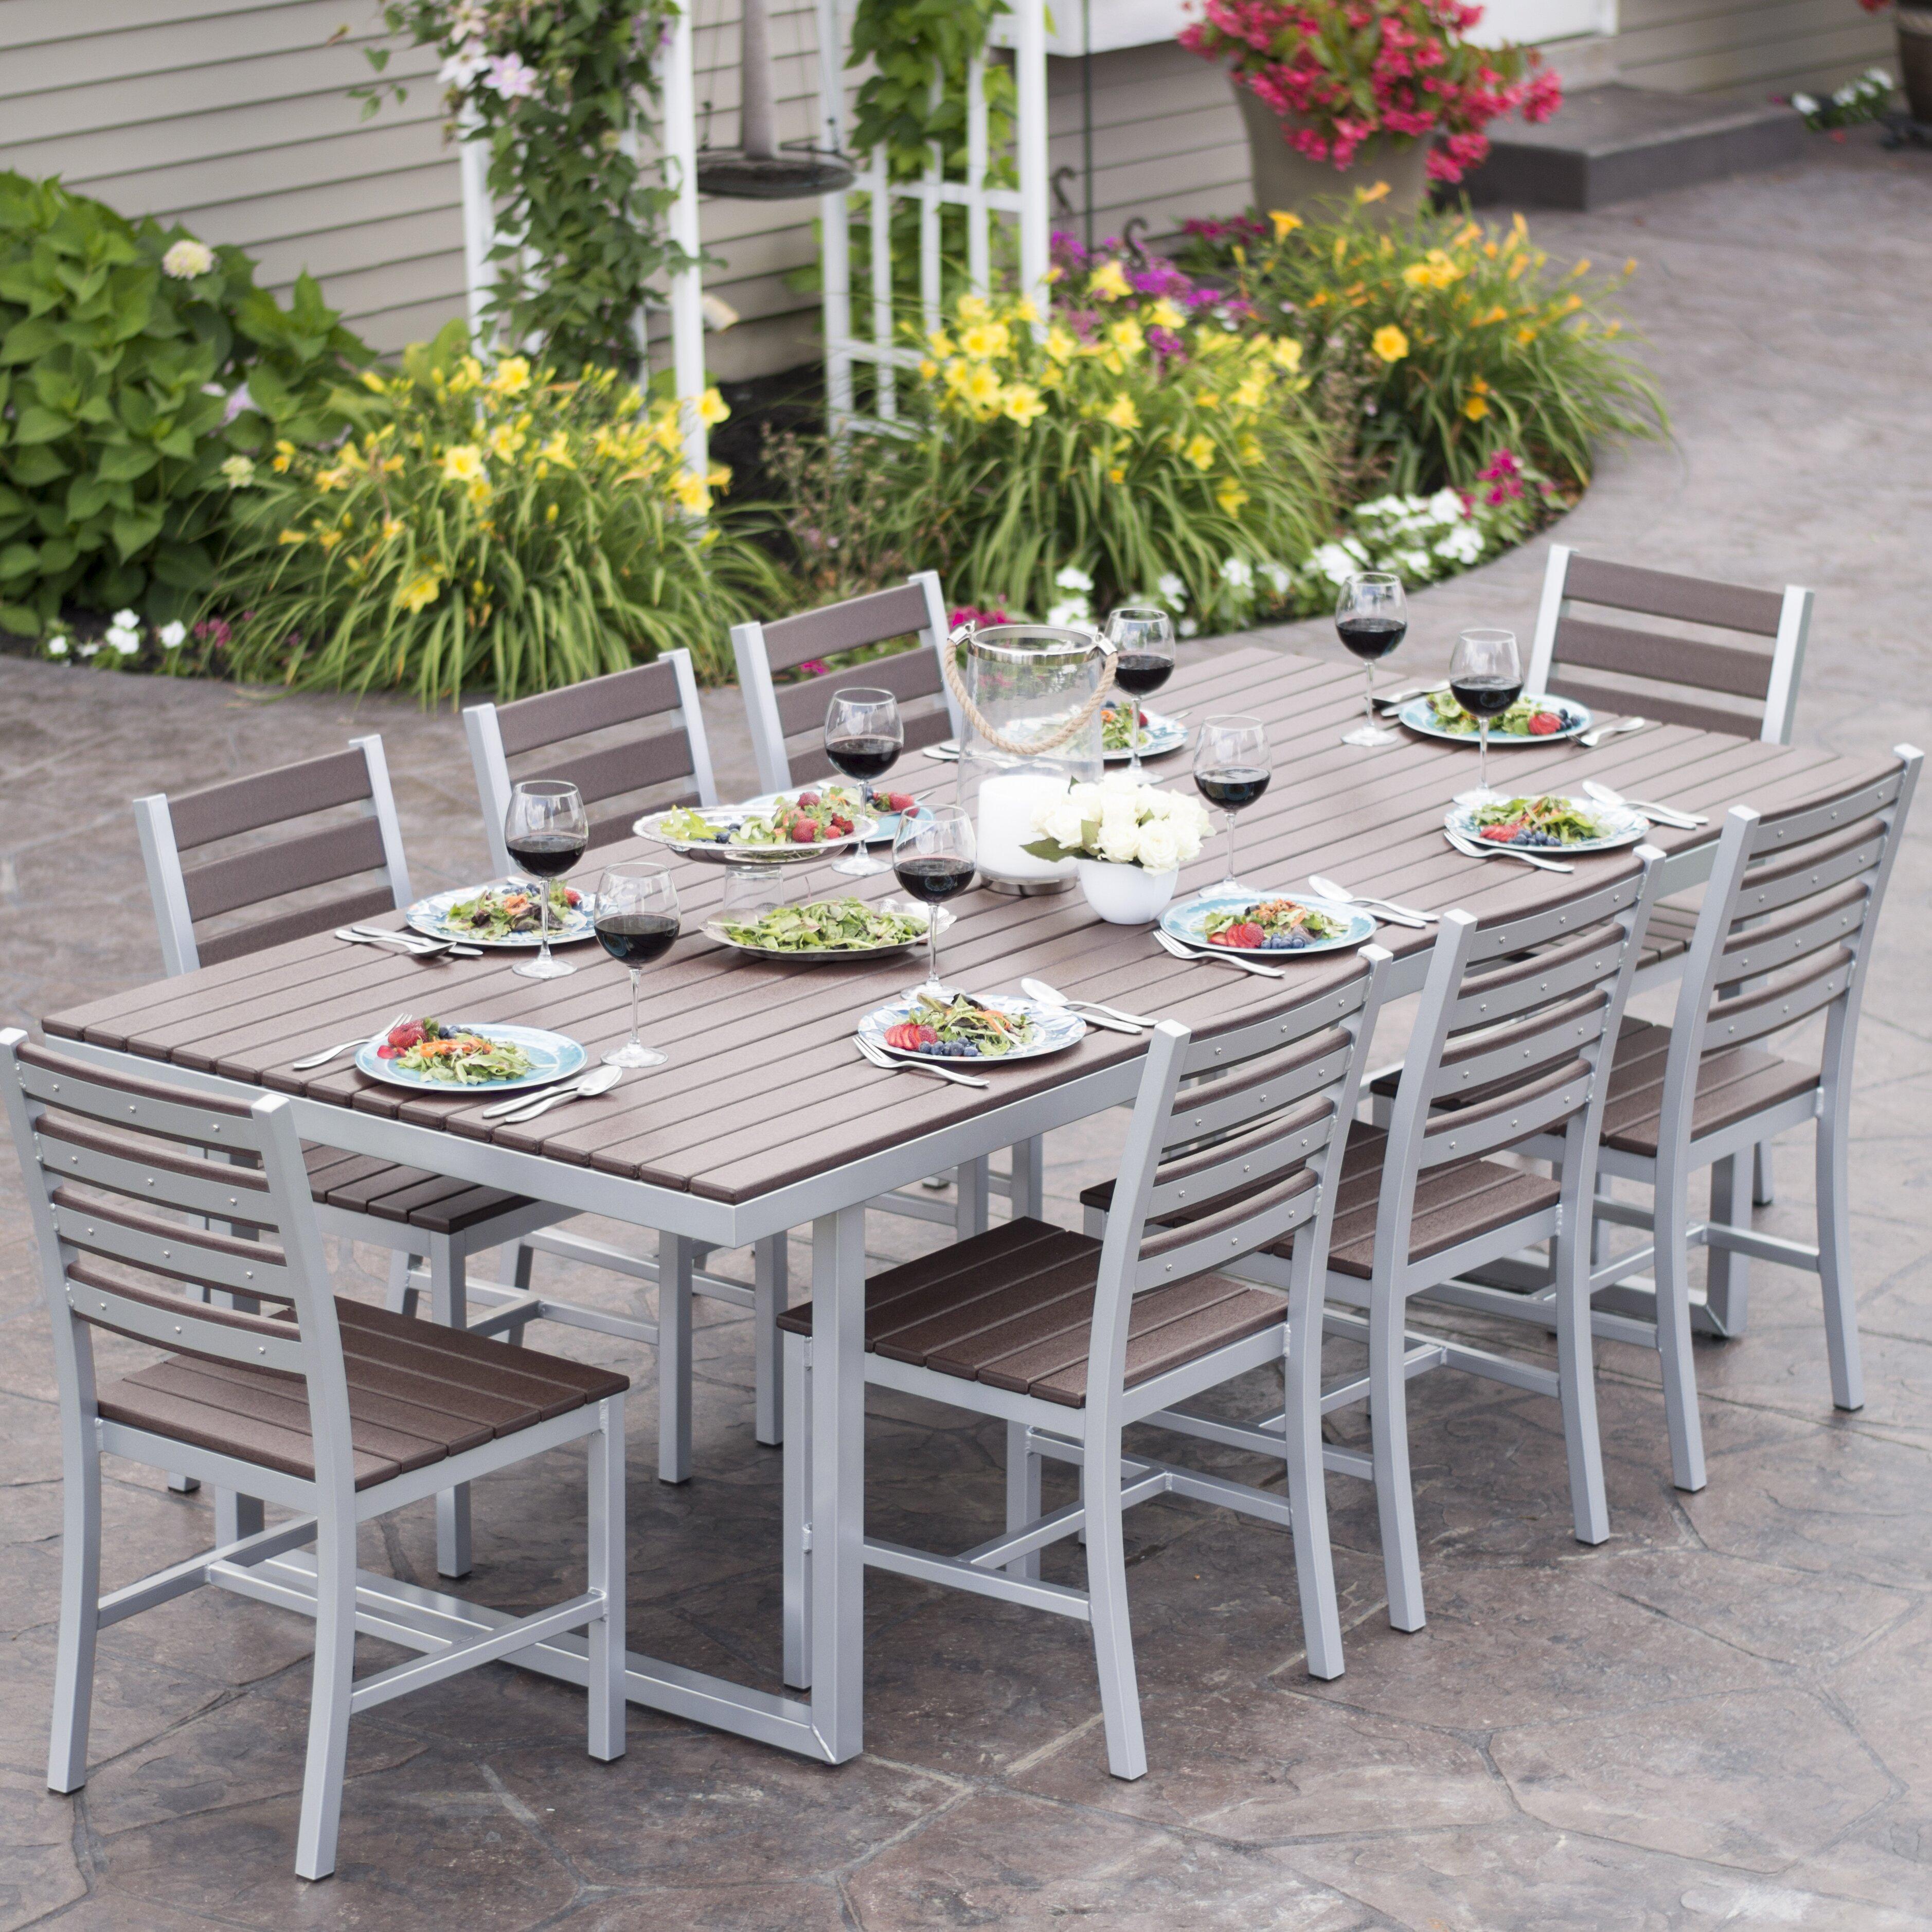 Elan furniture kinzie 9 piece dining set reviews wayfair for Outdoor furniture 9 piece